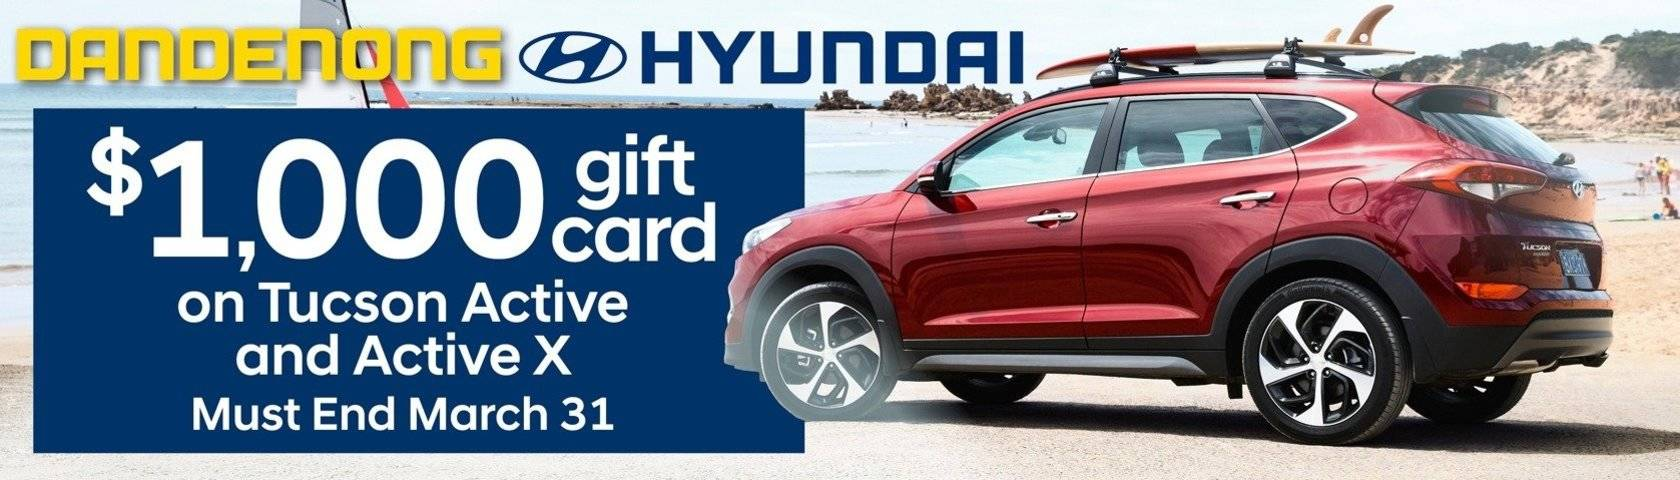 Dandenong Hyundai $1000 Gift Card